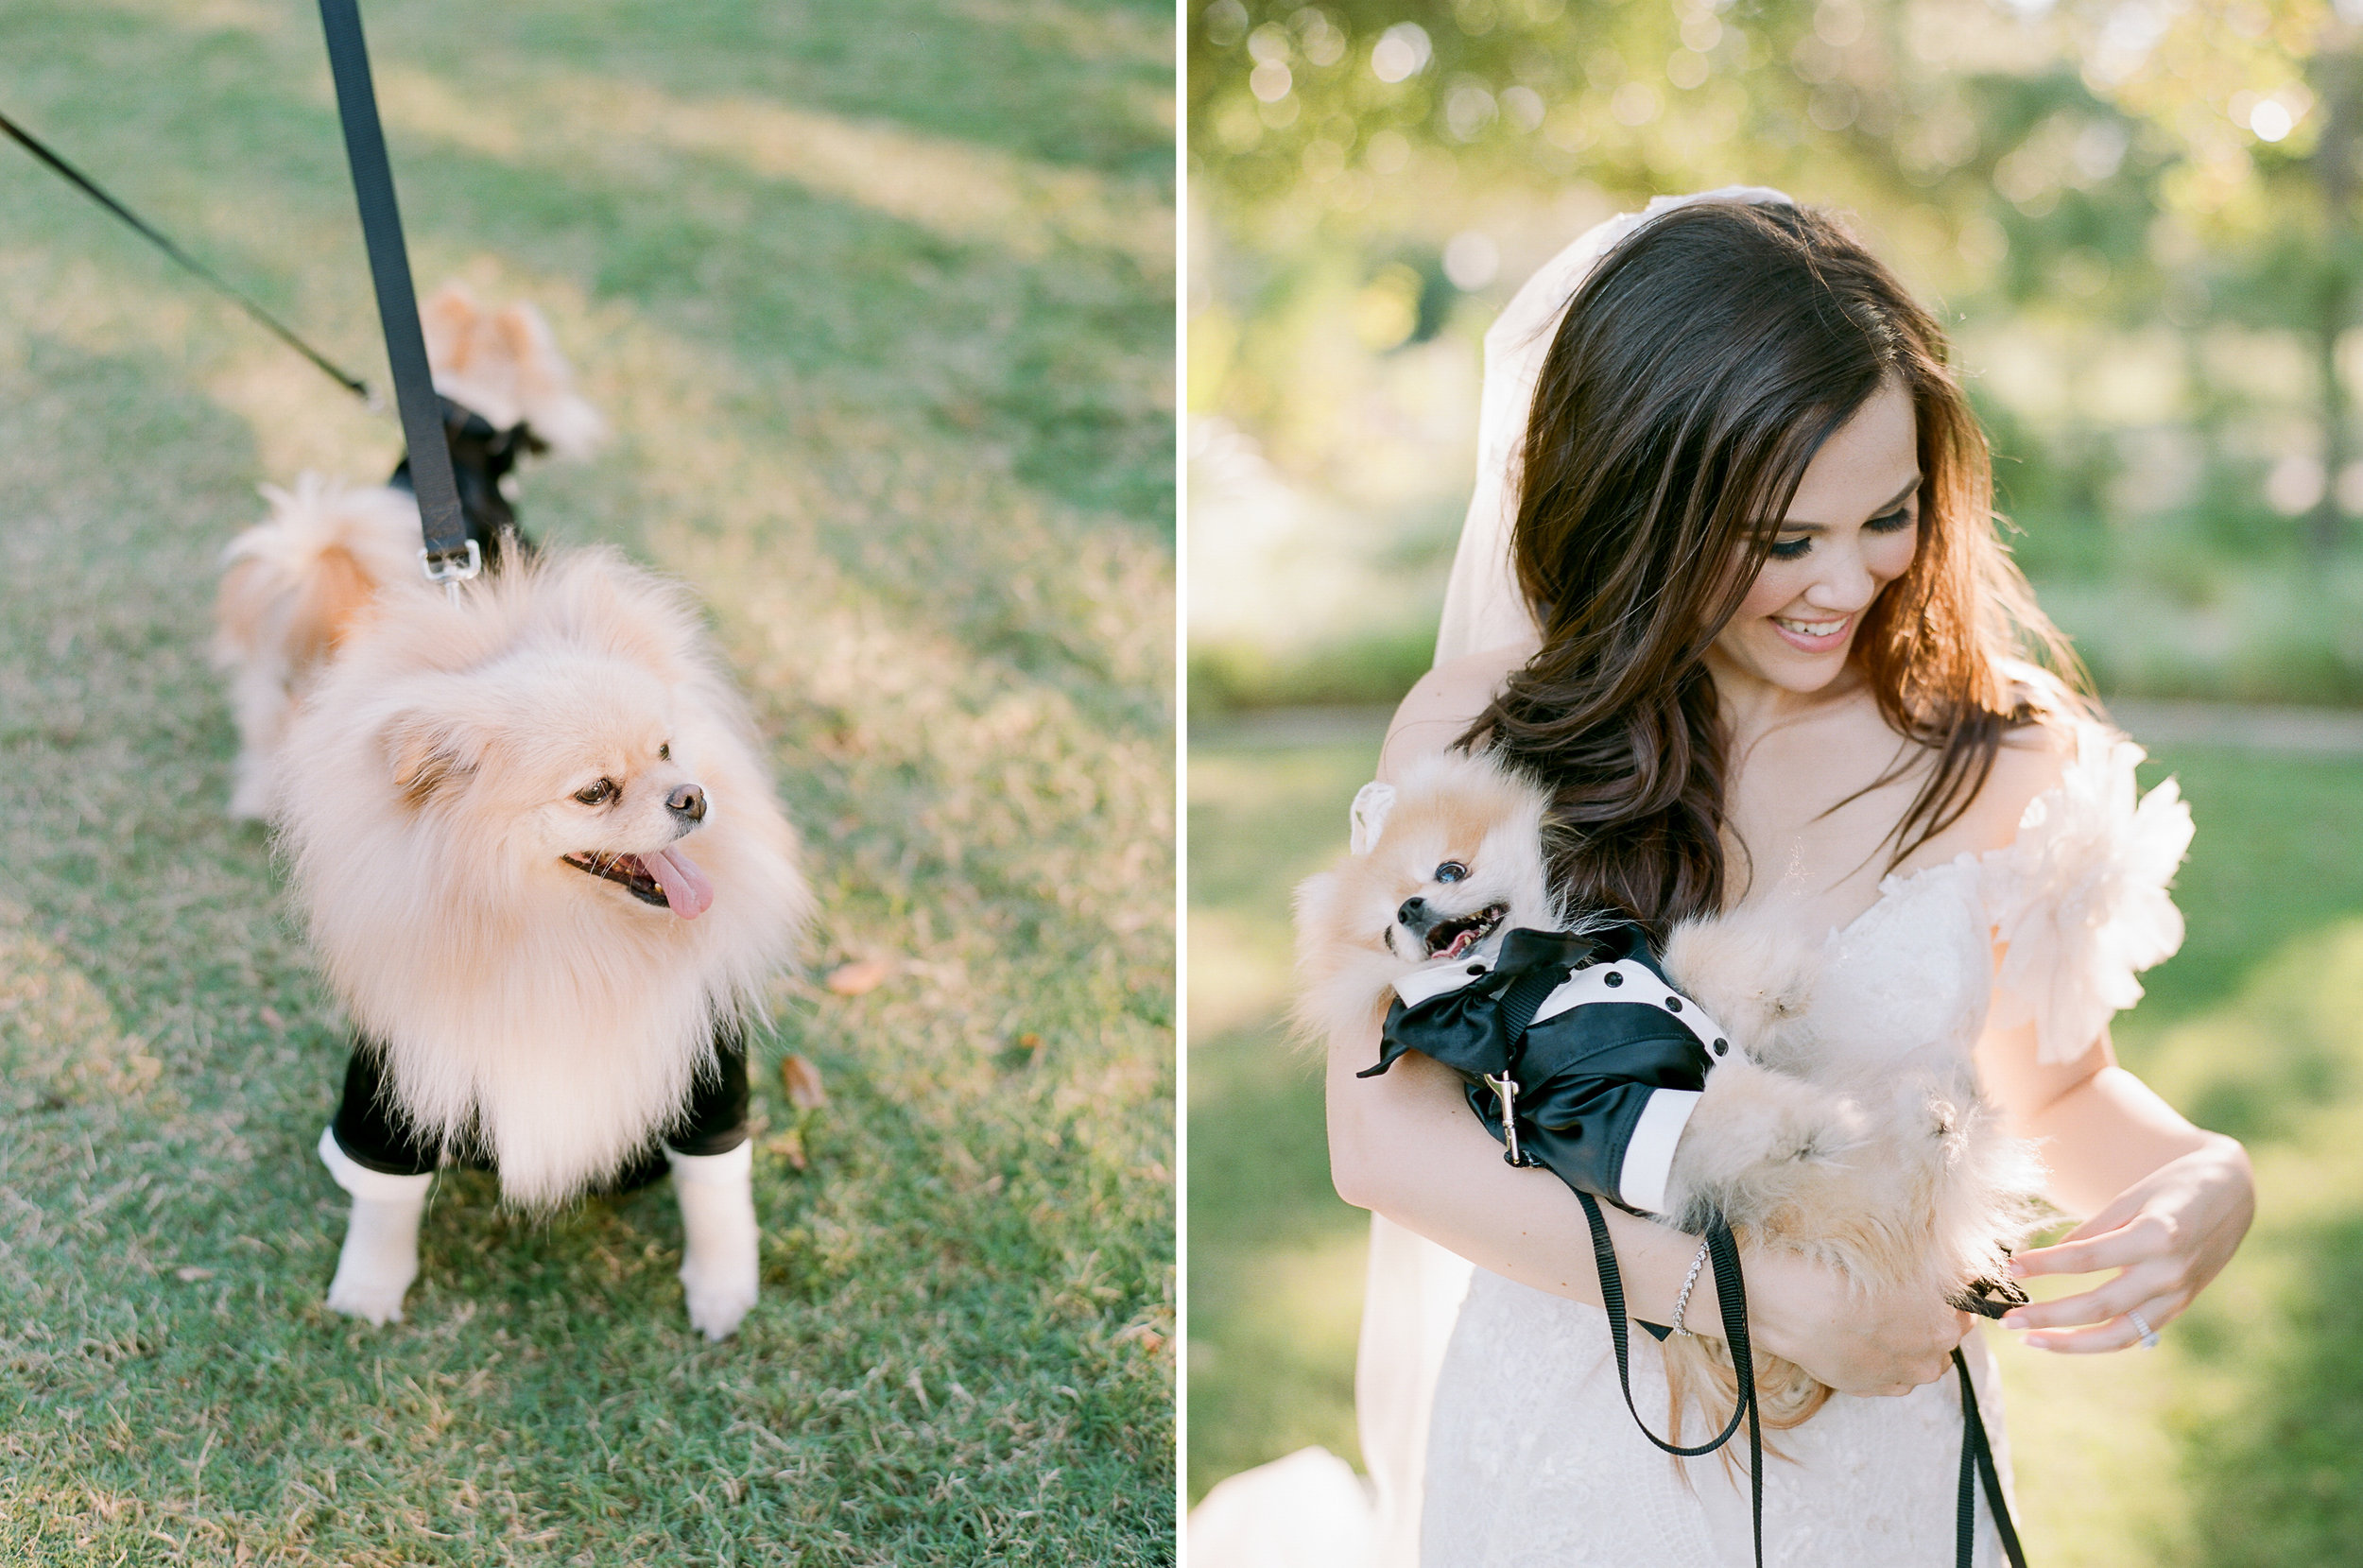 Martha-Stewart-Wedding-Dana-Fernandez-Photography-Josh-Texas-Film-Houston-Wedding-Fine-Art-Photographer-McGovern-Centennial-Gardens-Top-Best-308.jpg